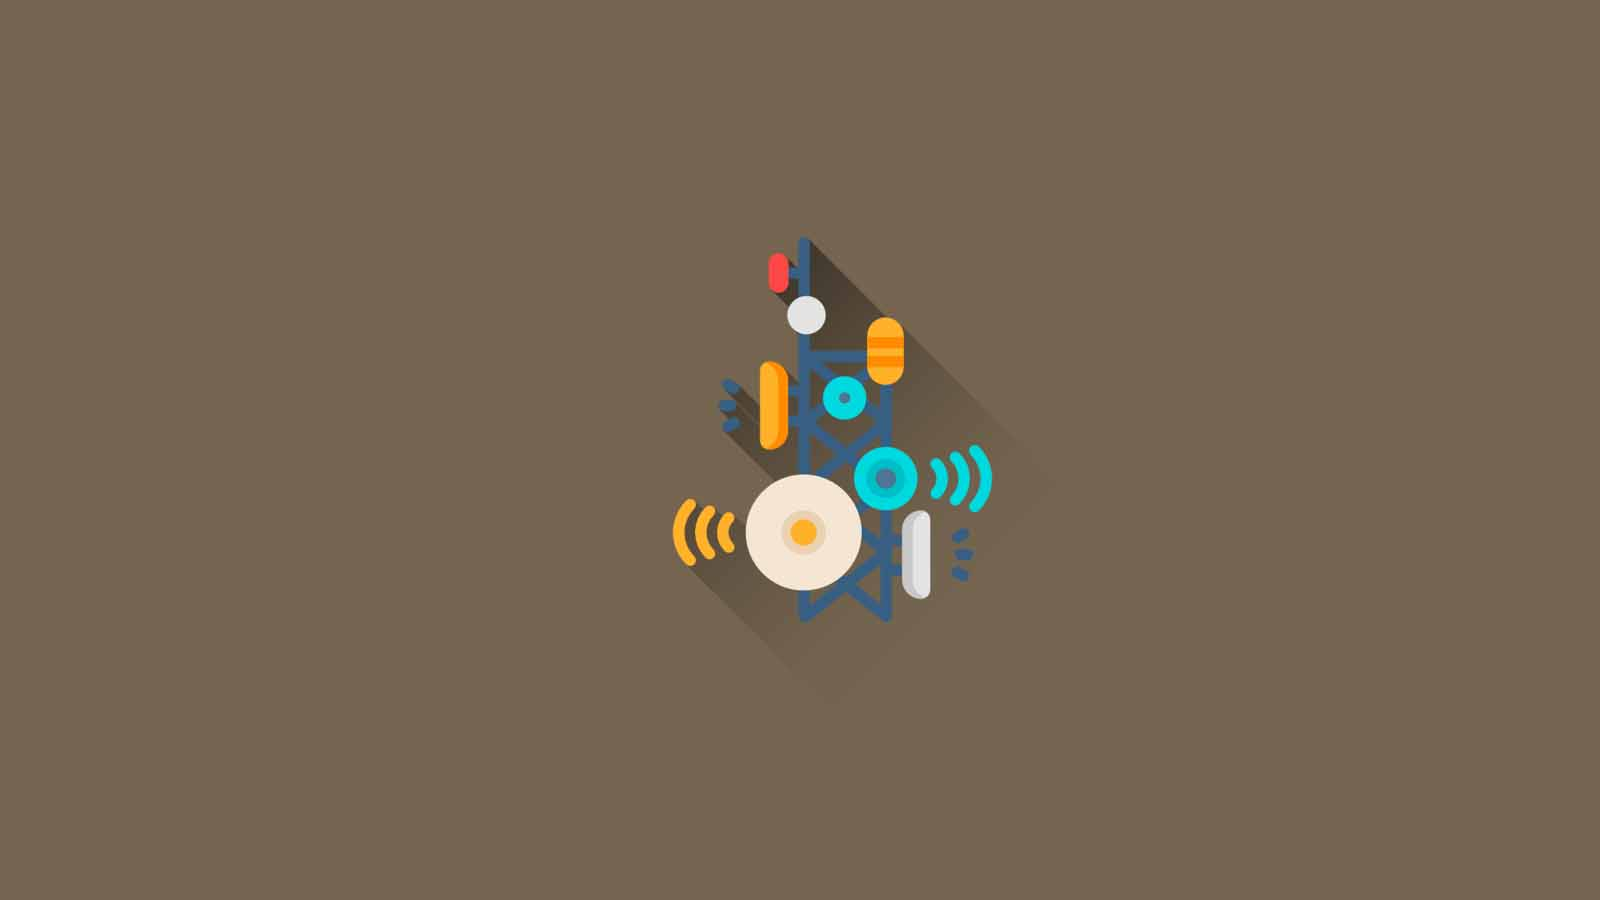 Daftar Isi - Telekomunikasi